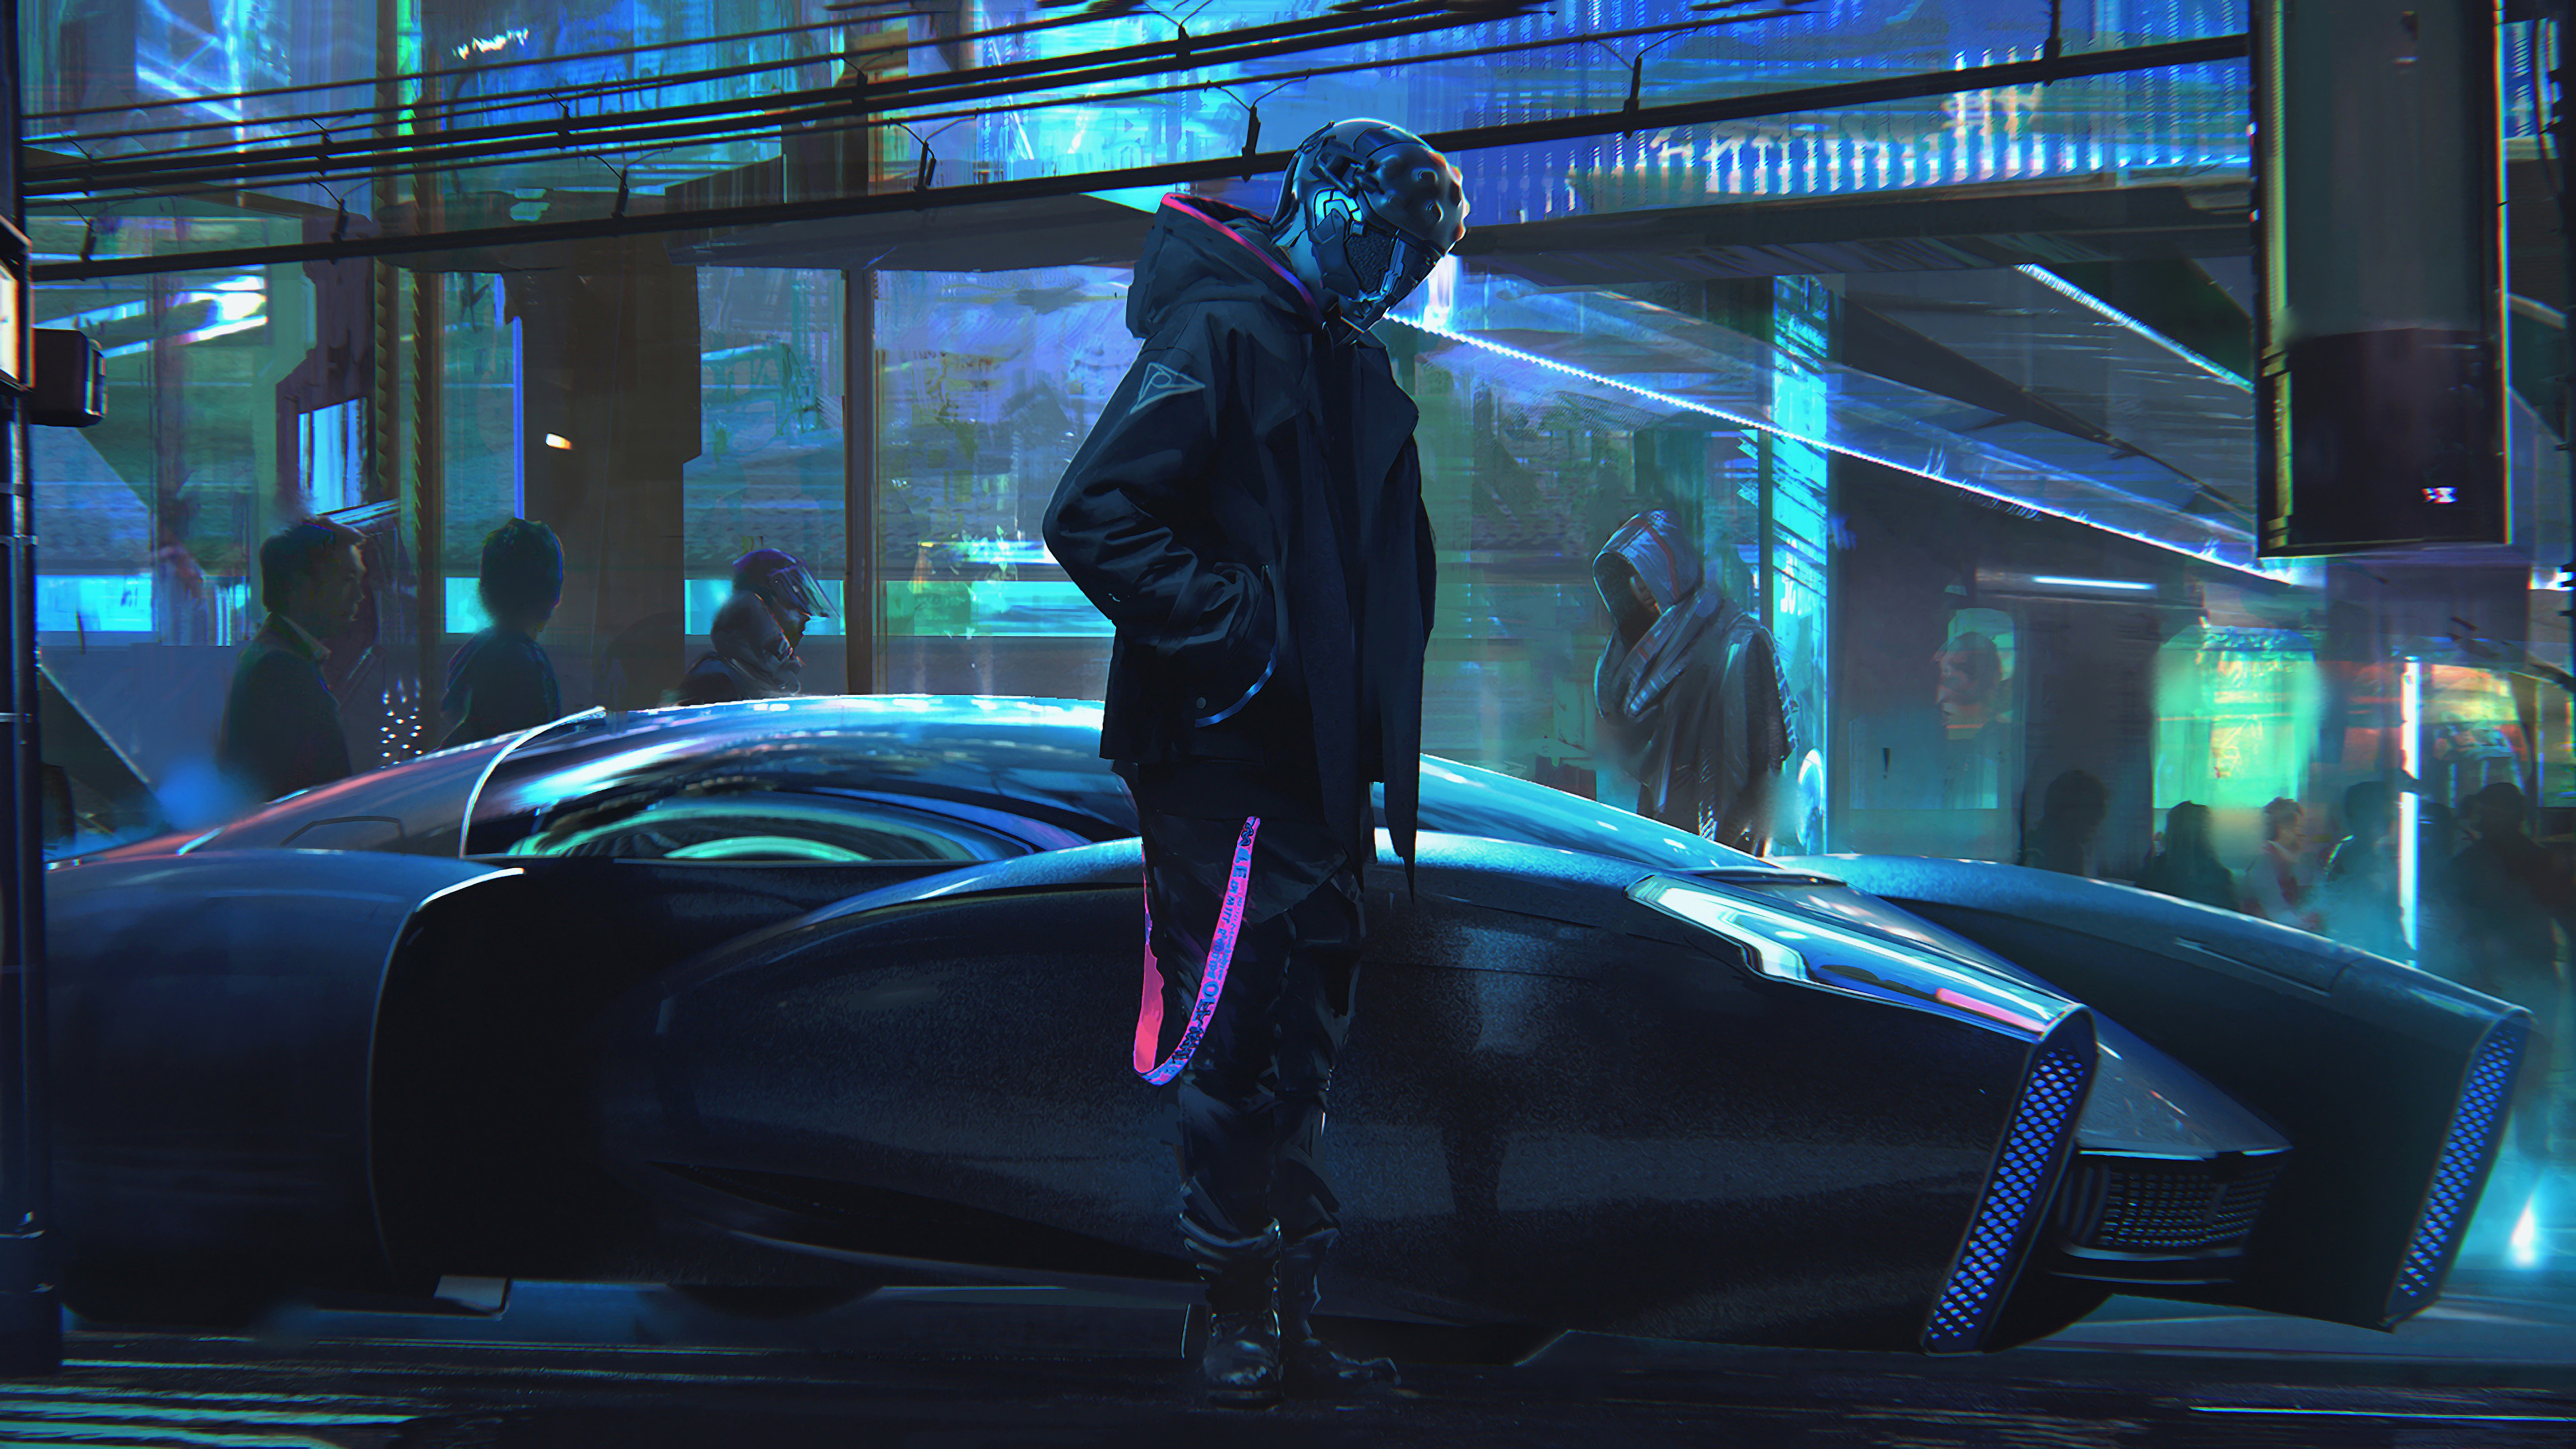 General 3840x2160 digital digital art artwork futuristic futuristic city city city lights lights car vehicle transport people concept art neon lights neon cyber cyberpunk hoods environment science fiction cyan